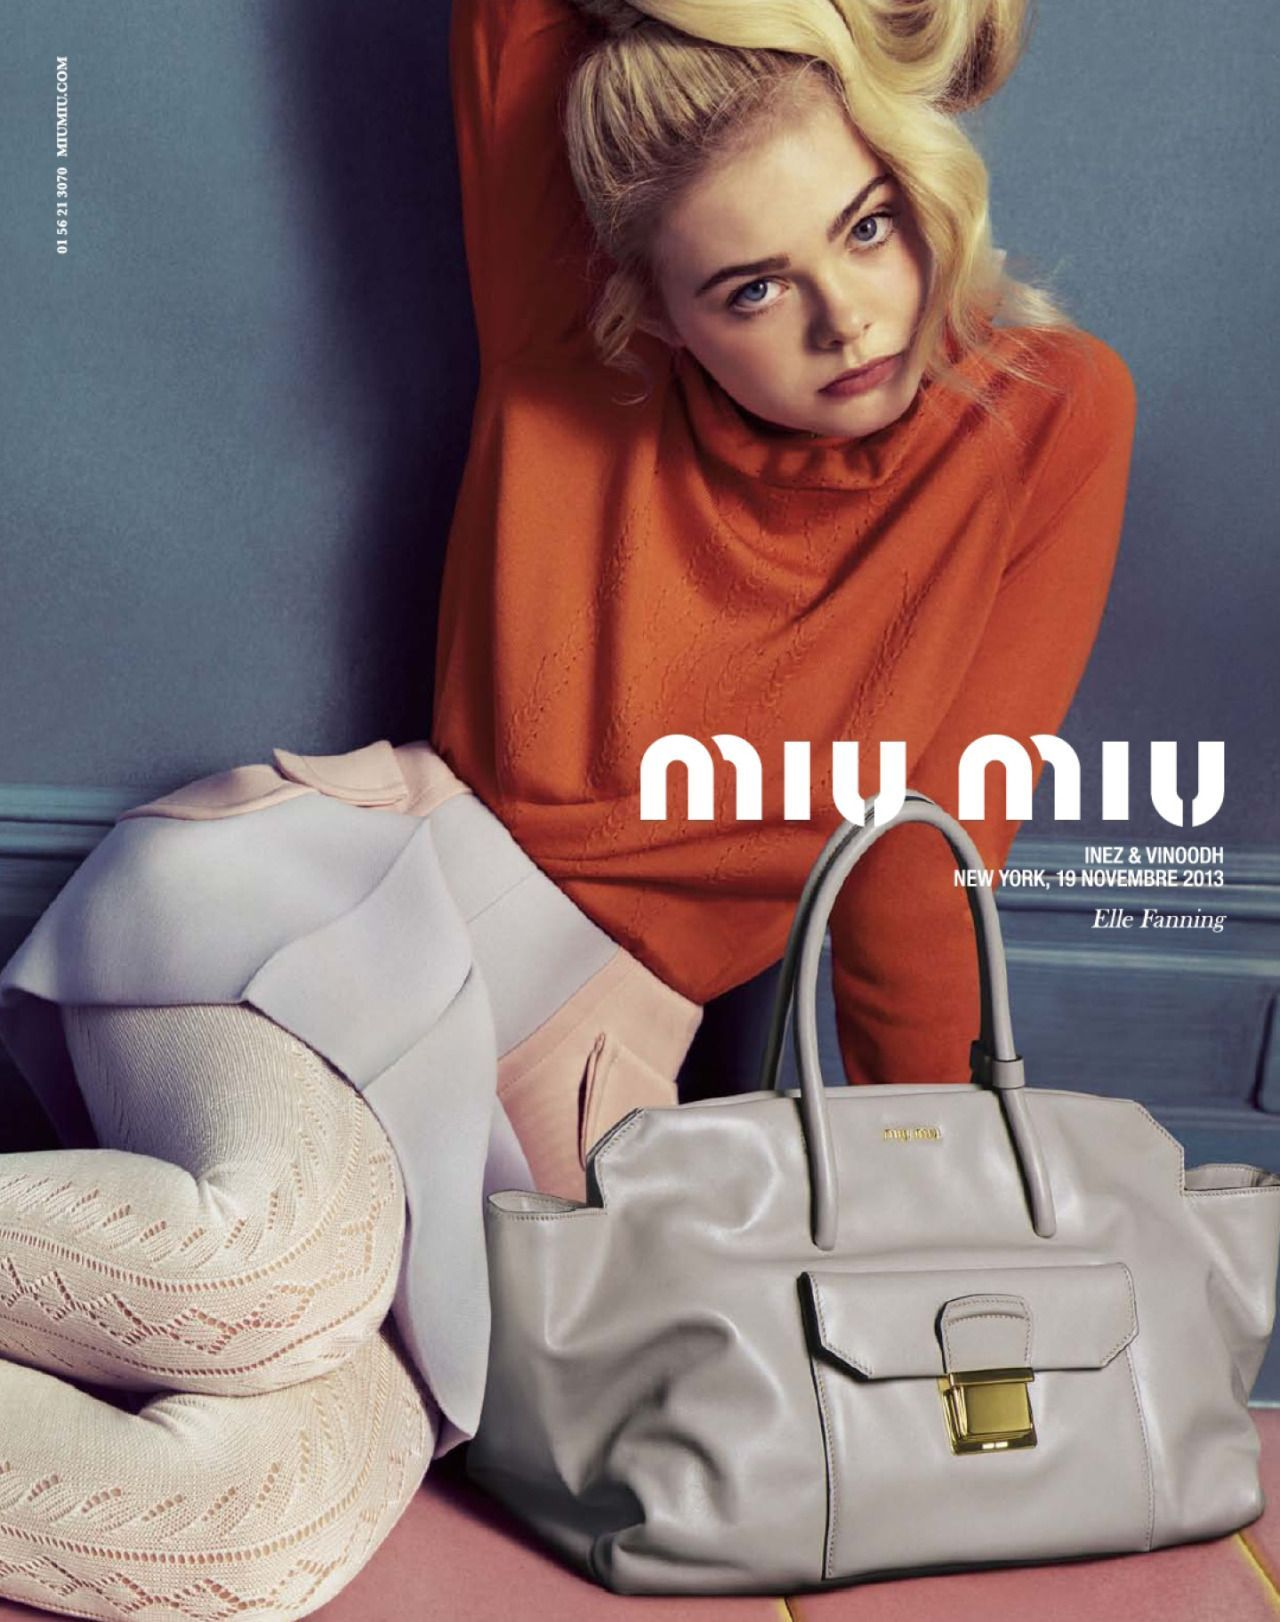 d320af09682ee miumiu-mew  Elle Fanning by Inez   Vinoodh for the Miu Miu Spring Summer  2014 Campaign  miumiueditorial